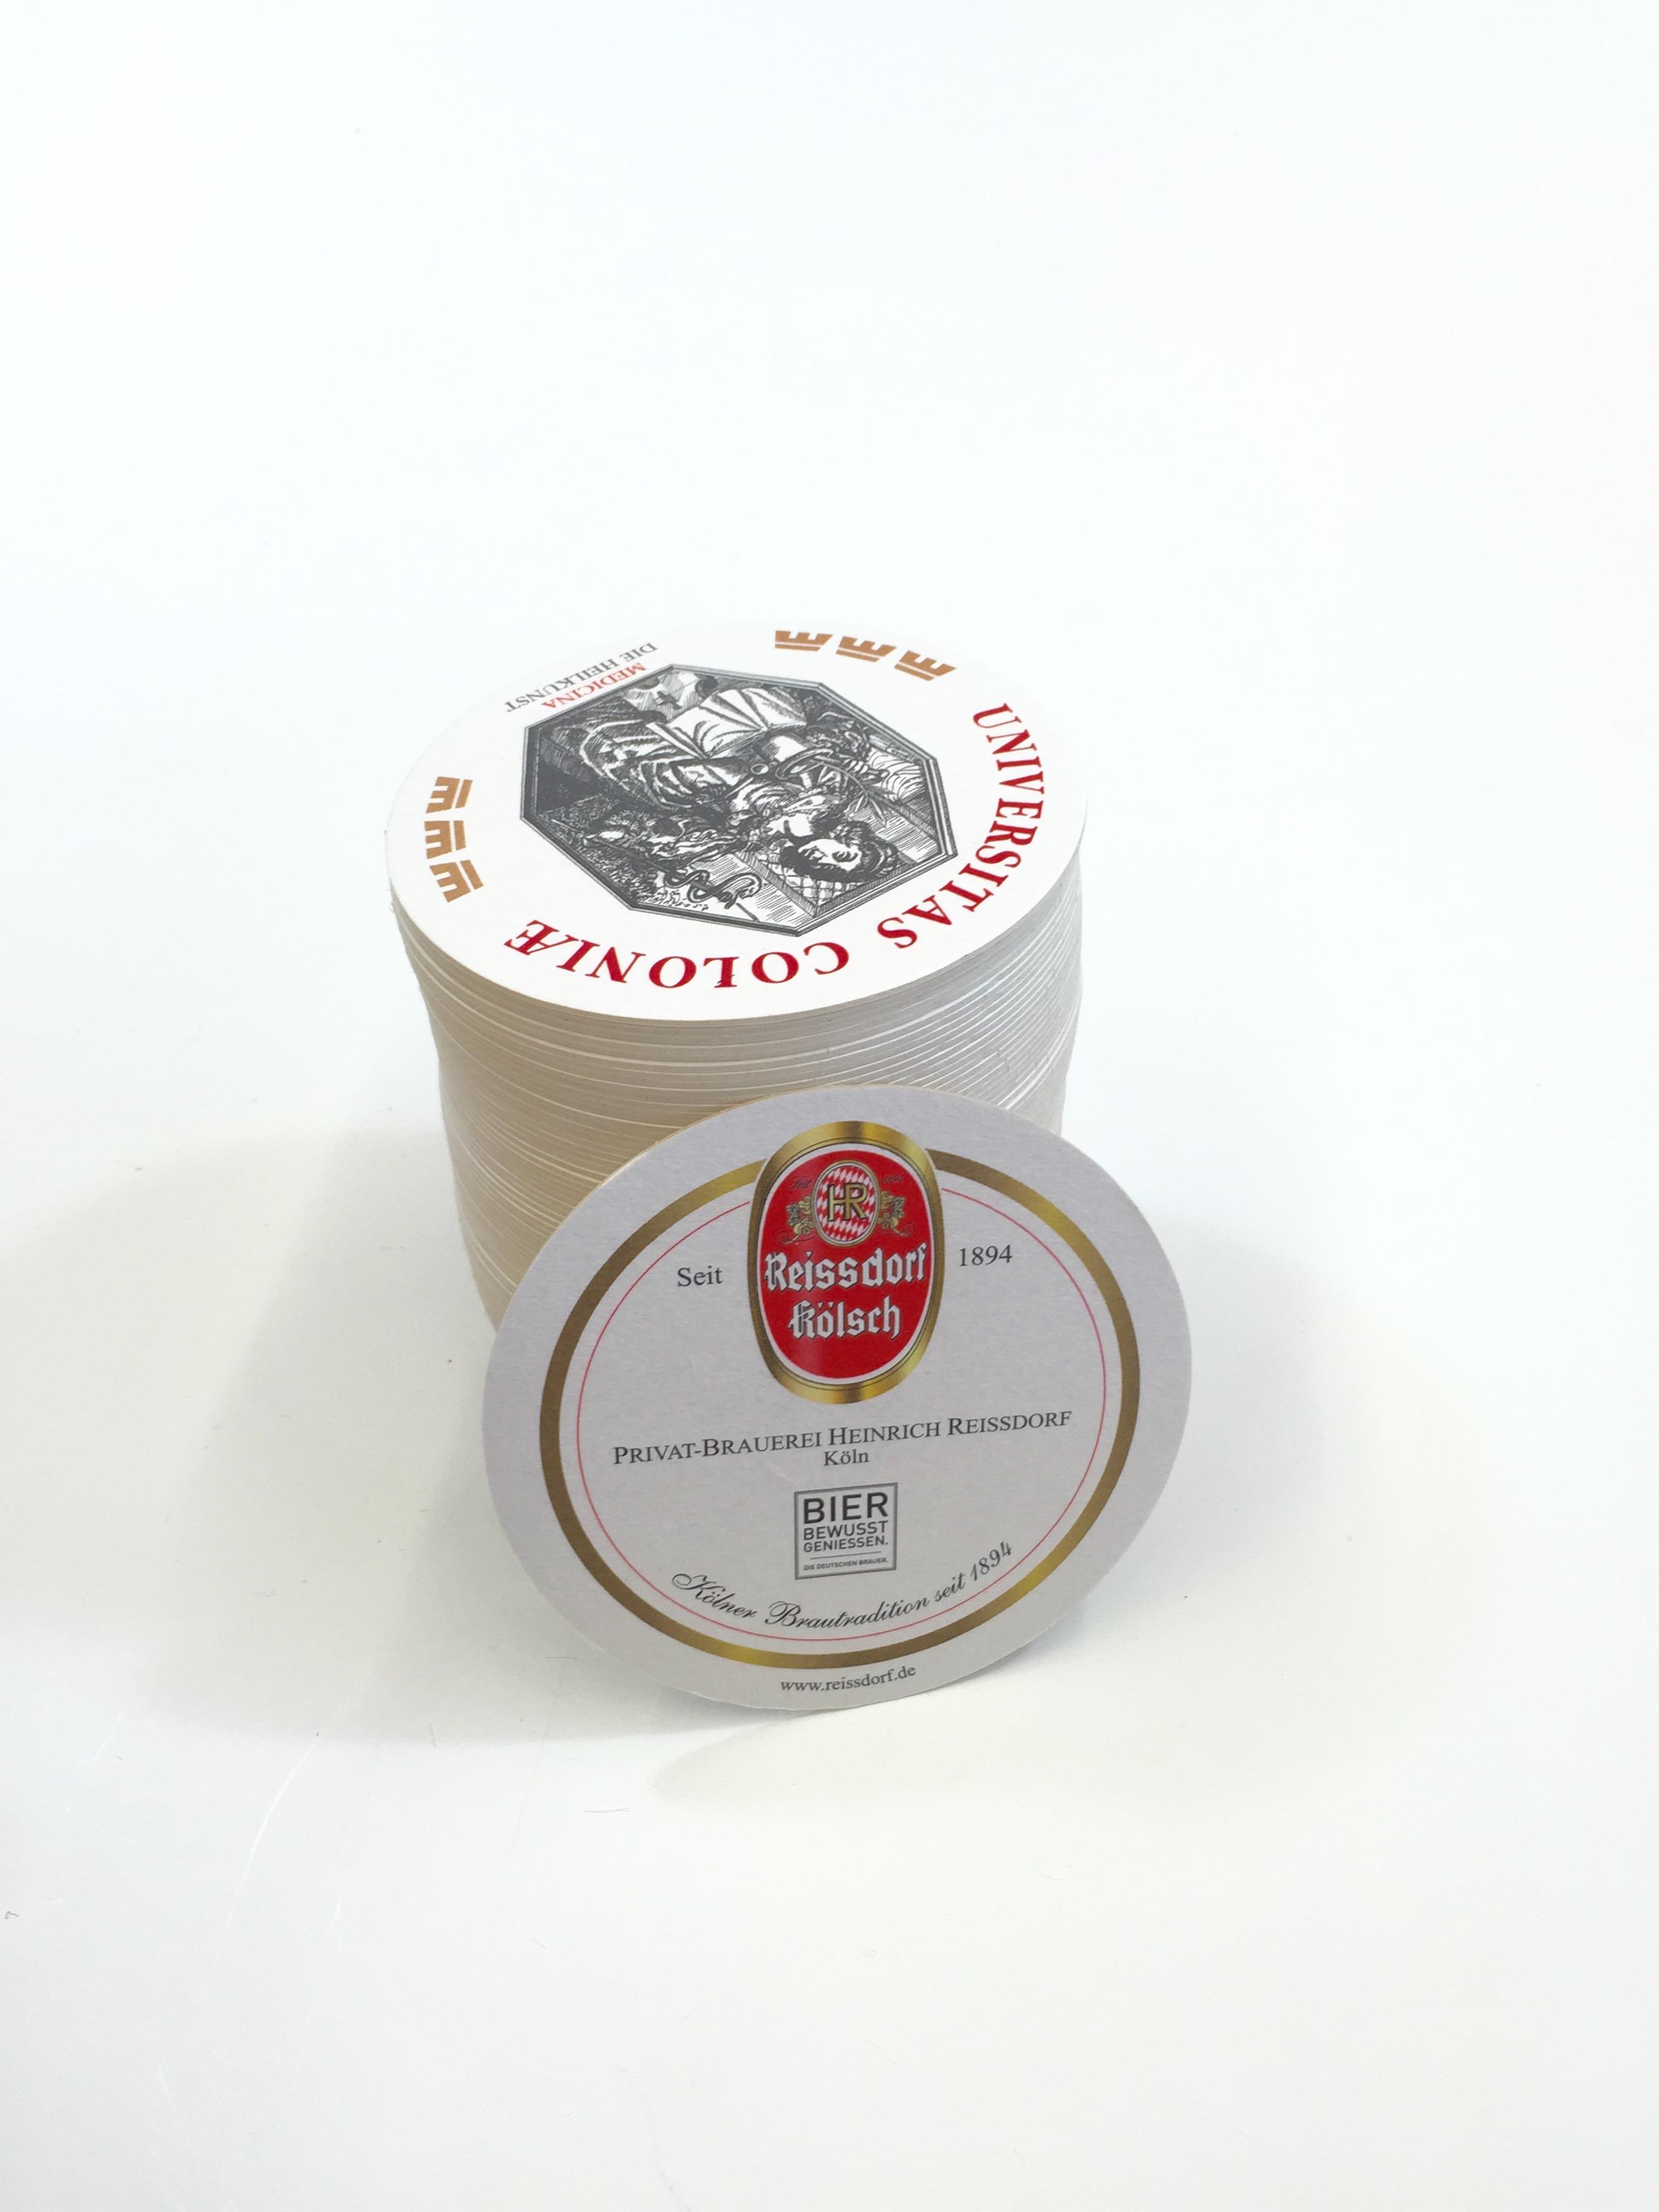 Reissdorf Kölsch 240 Bierdeckel